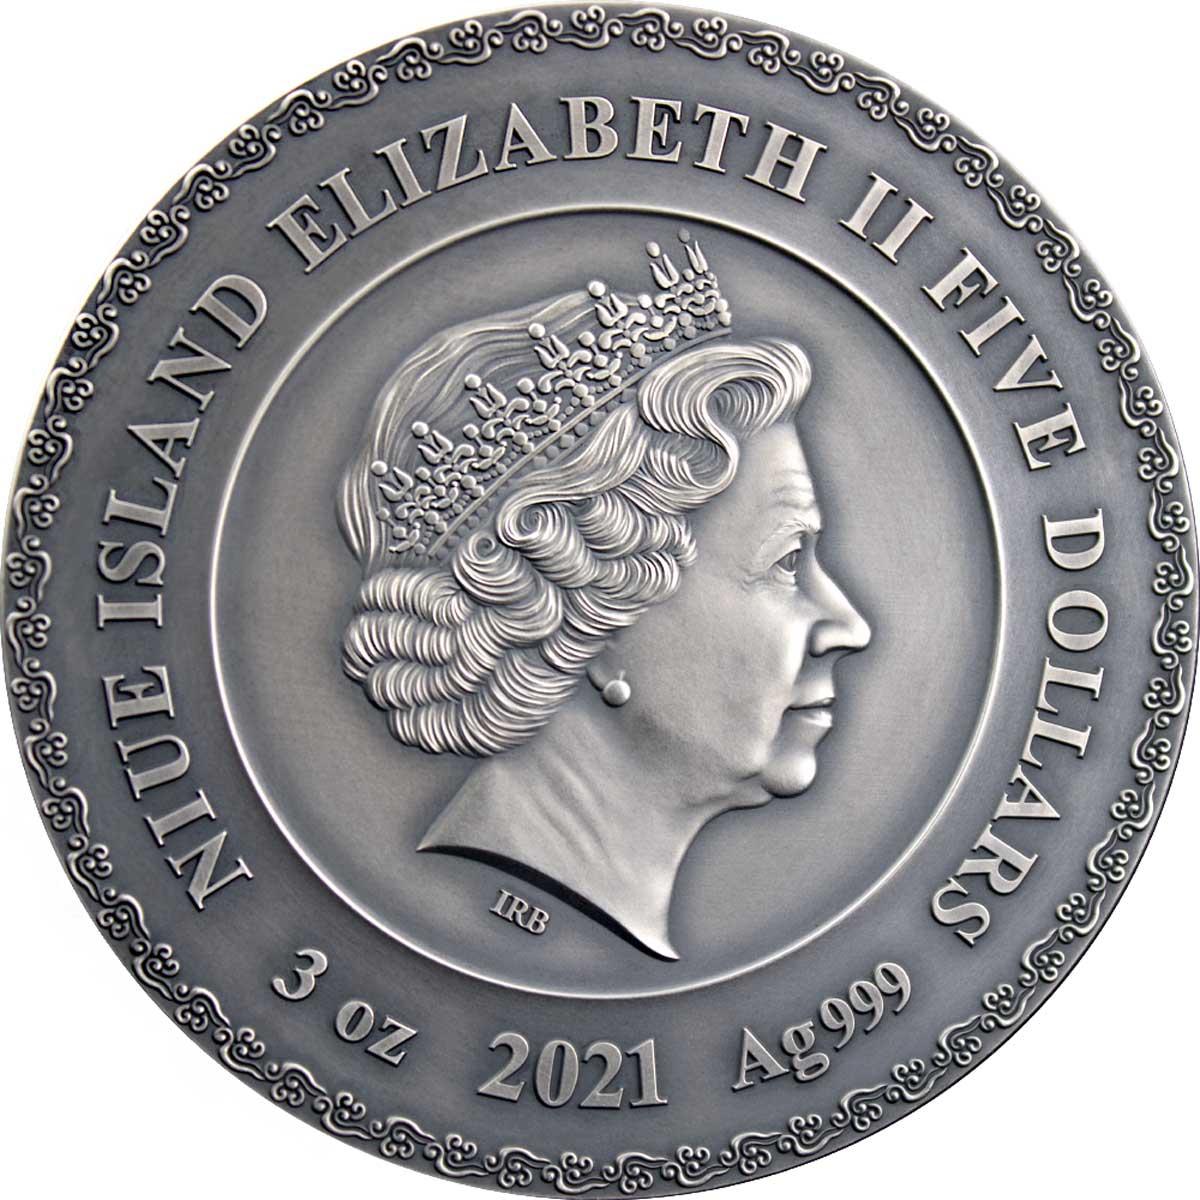 Ниуэ монета 5 долларов 2021 год, аверс